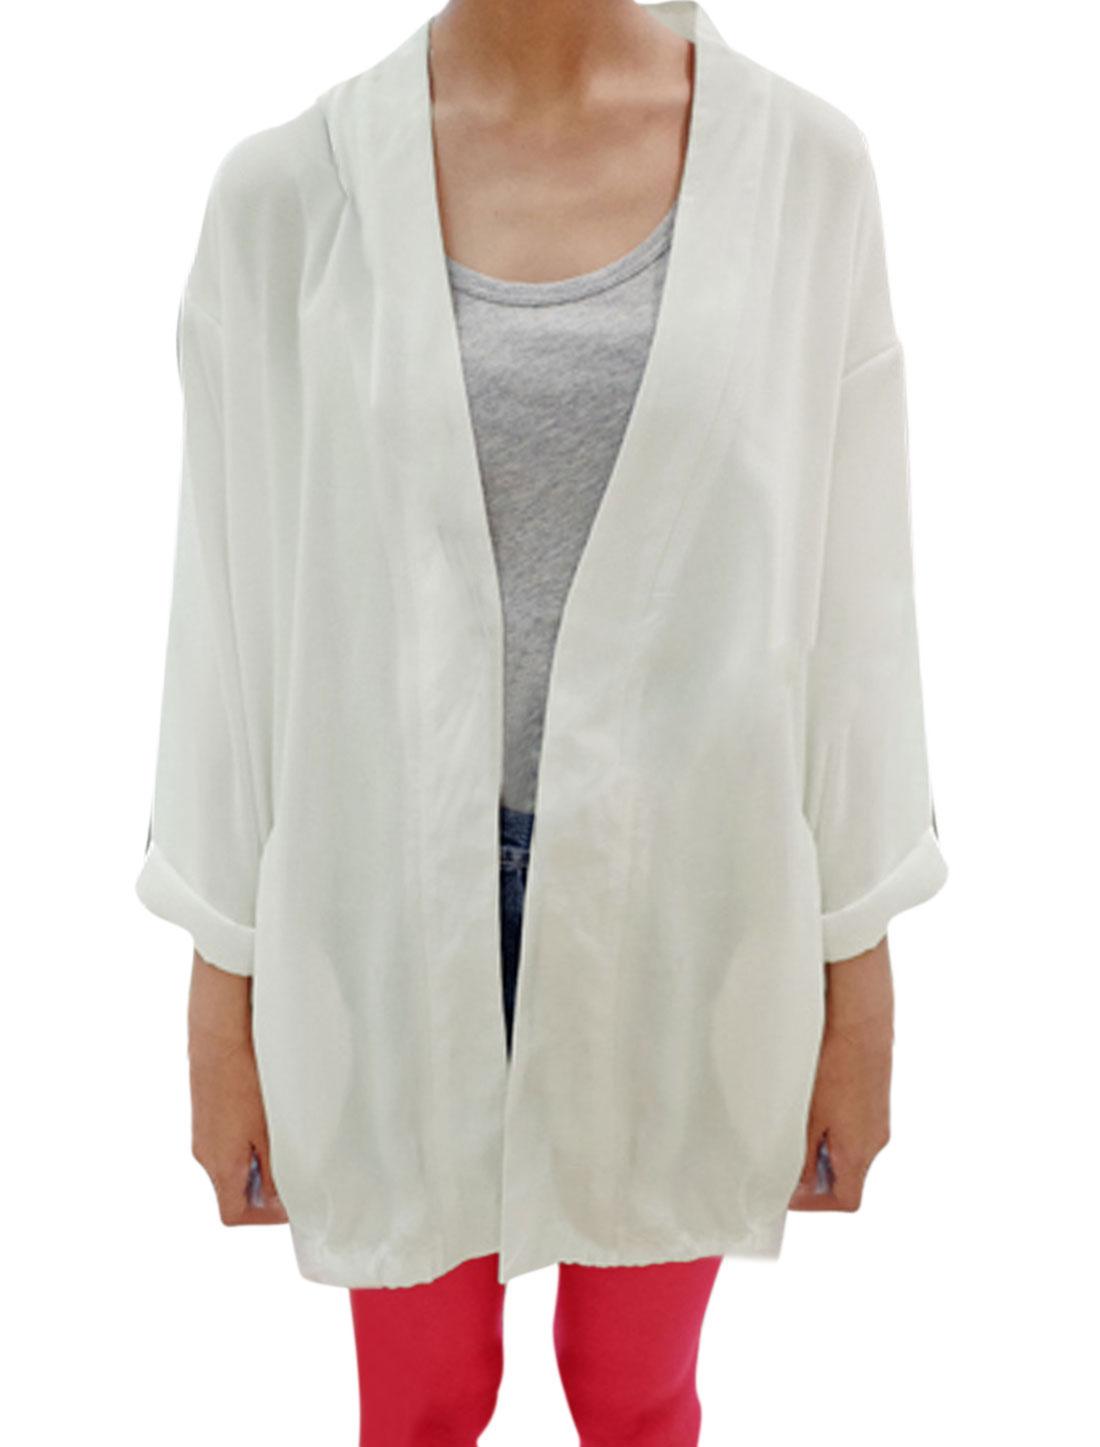 Lady Long Sleeve Front Opening Fashion Leisure Chiffon Cardigan White S